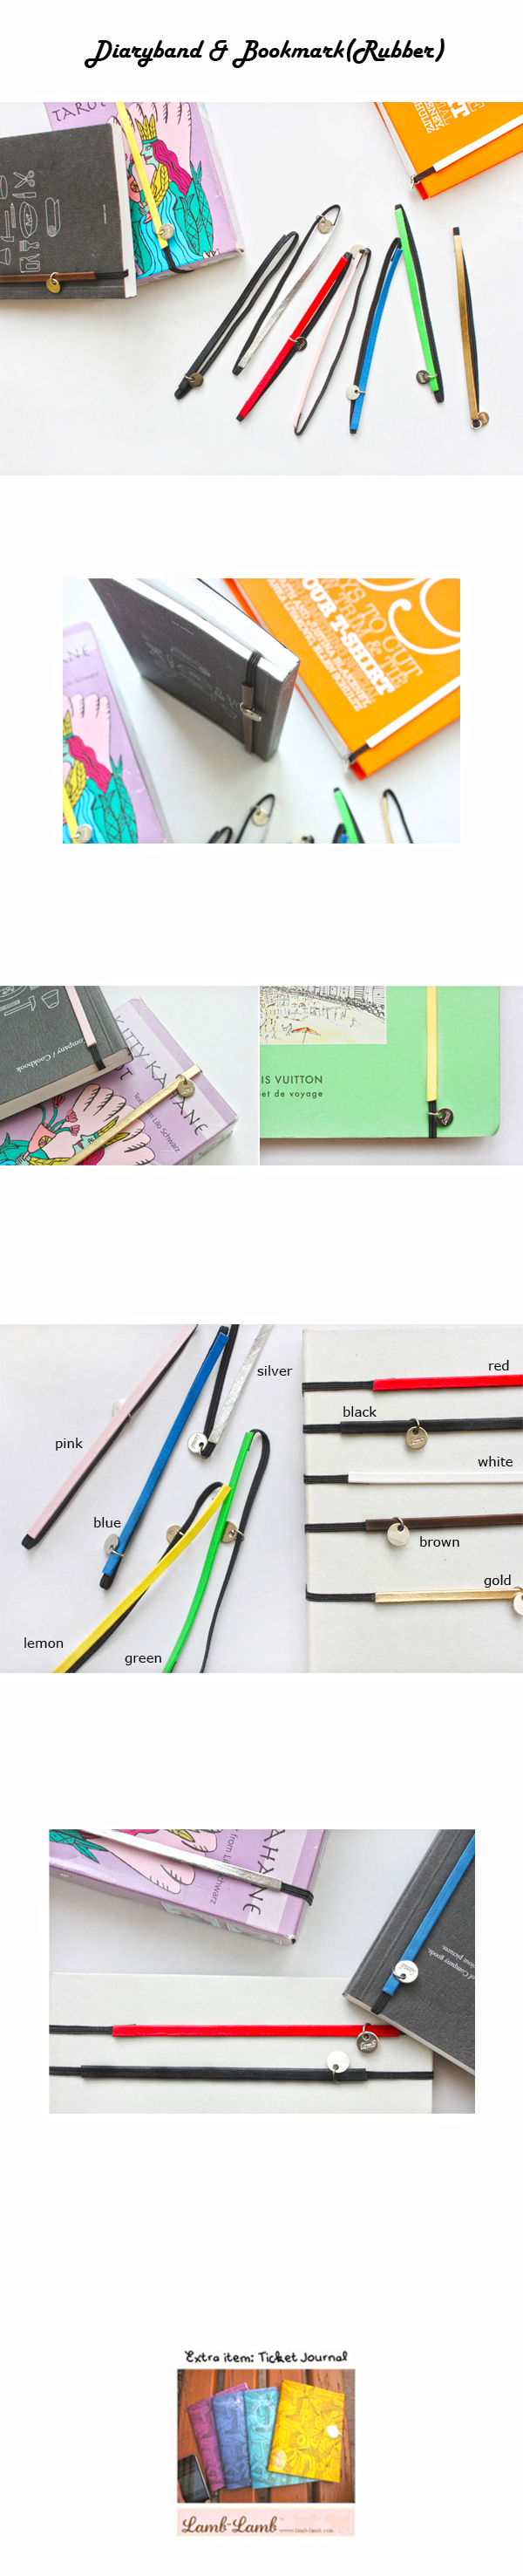 Diaryband and Bookmark(Rubber) - 램램, 2,800원, 다이어리액세서리, 밴드